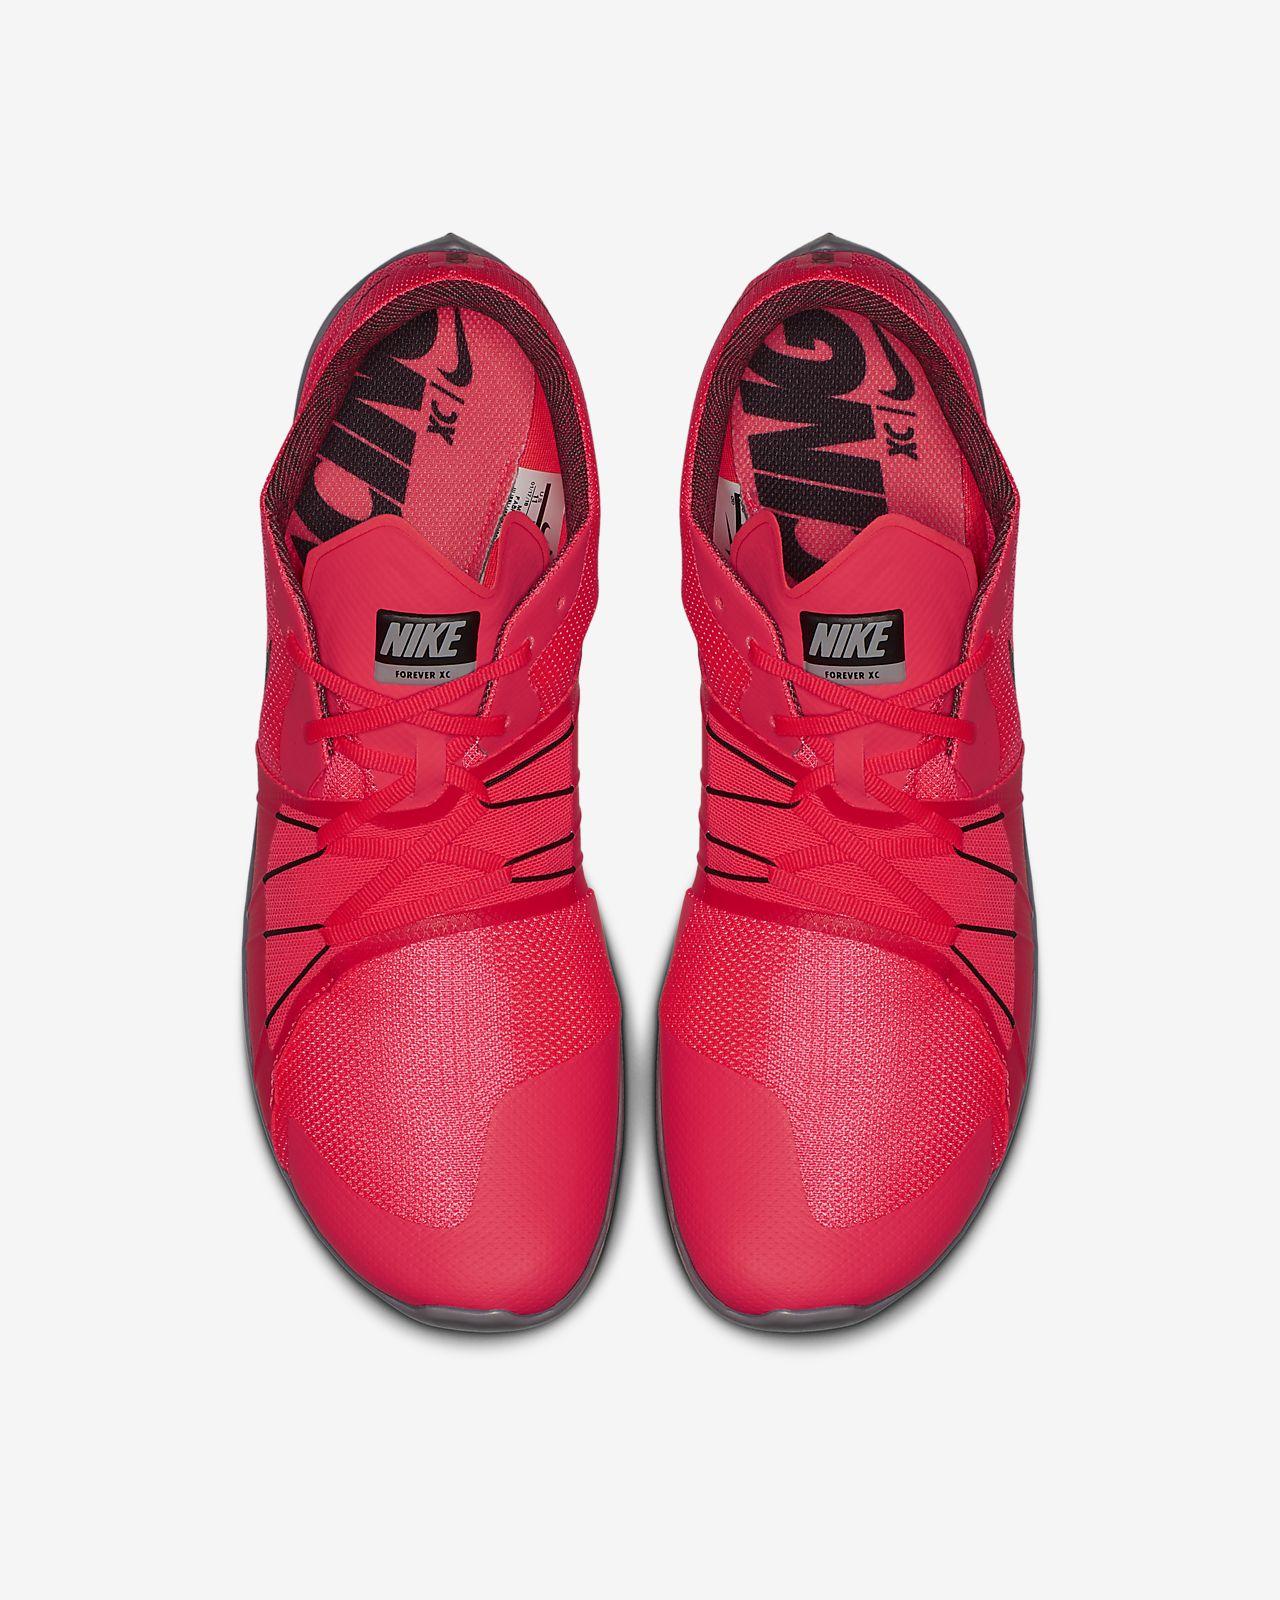 hot sale online f43da 825ce ... Nike Zoom Forever XC 5 Unisex Track Spike